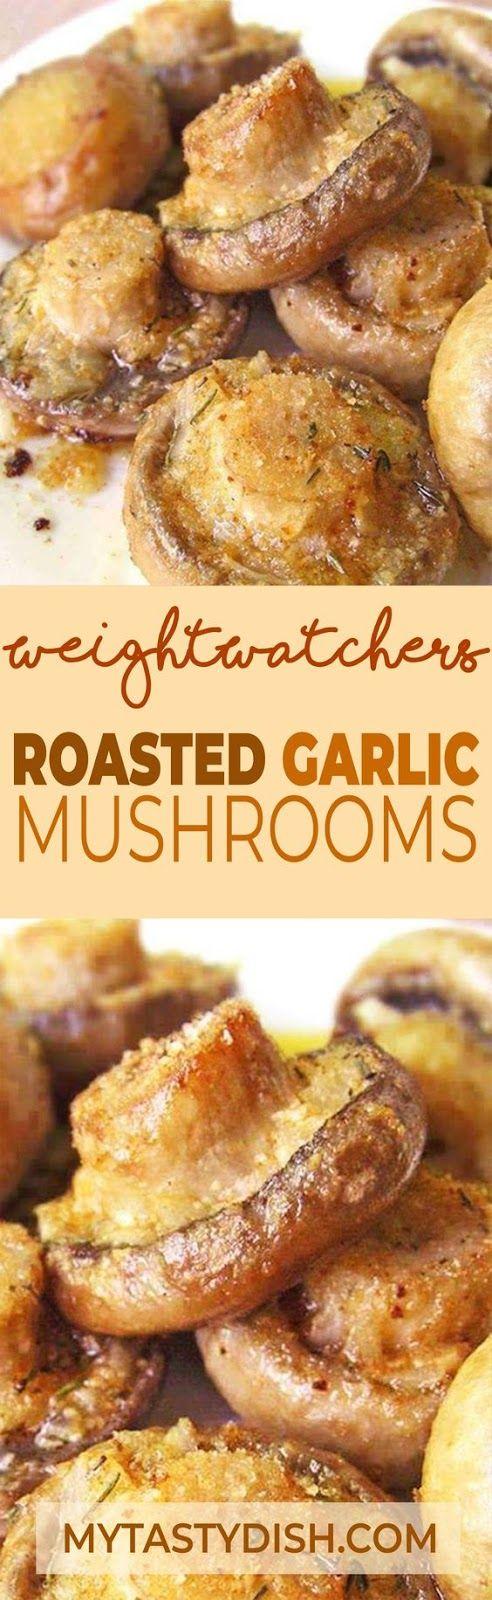 ROASTED GARLIC MUSHROOMS   Book Of Recipes